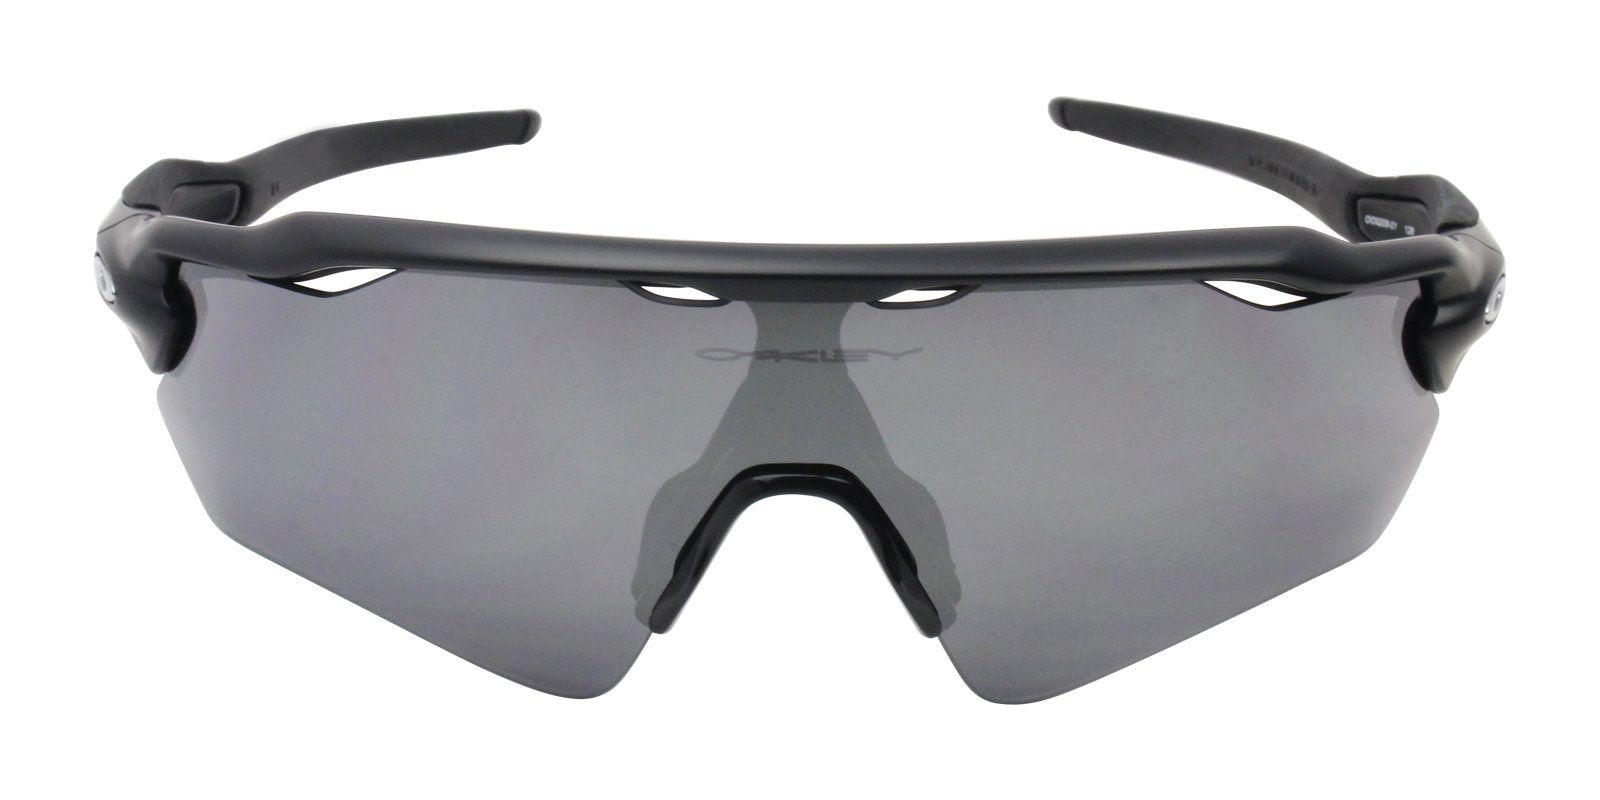 Oakley OO9208 Black Shield Men Sunglasses Sunglasses